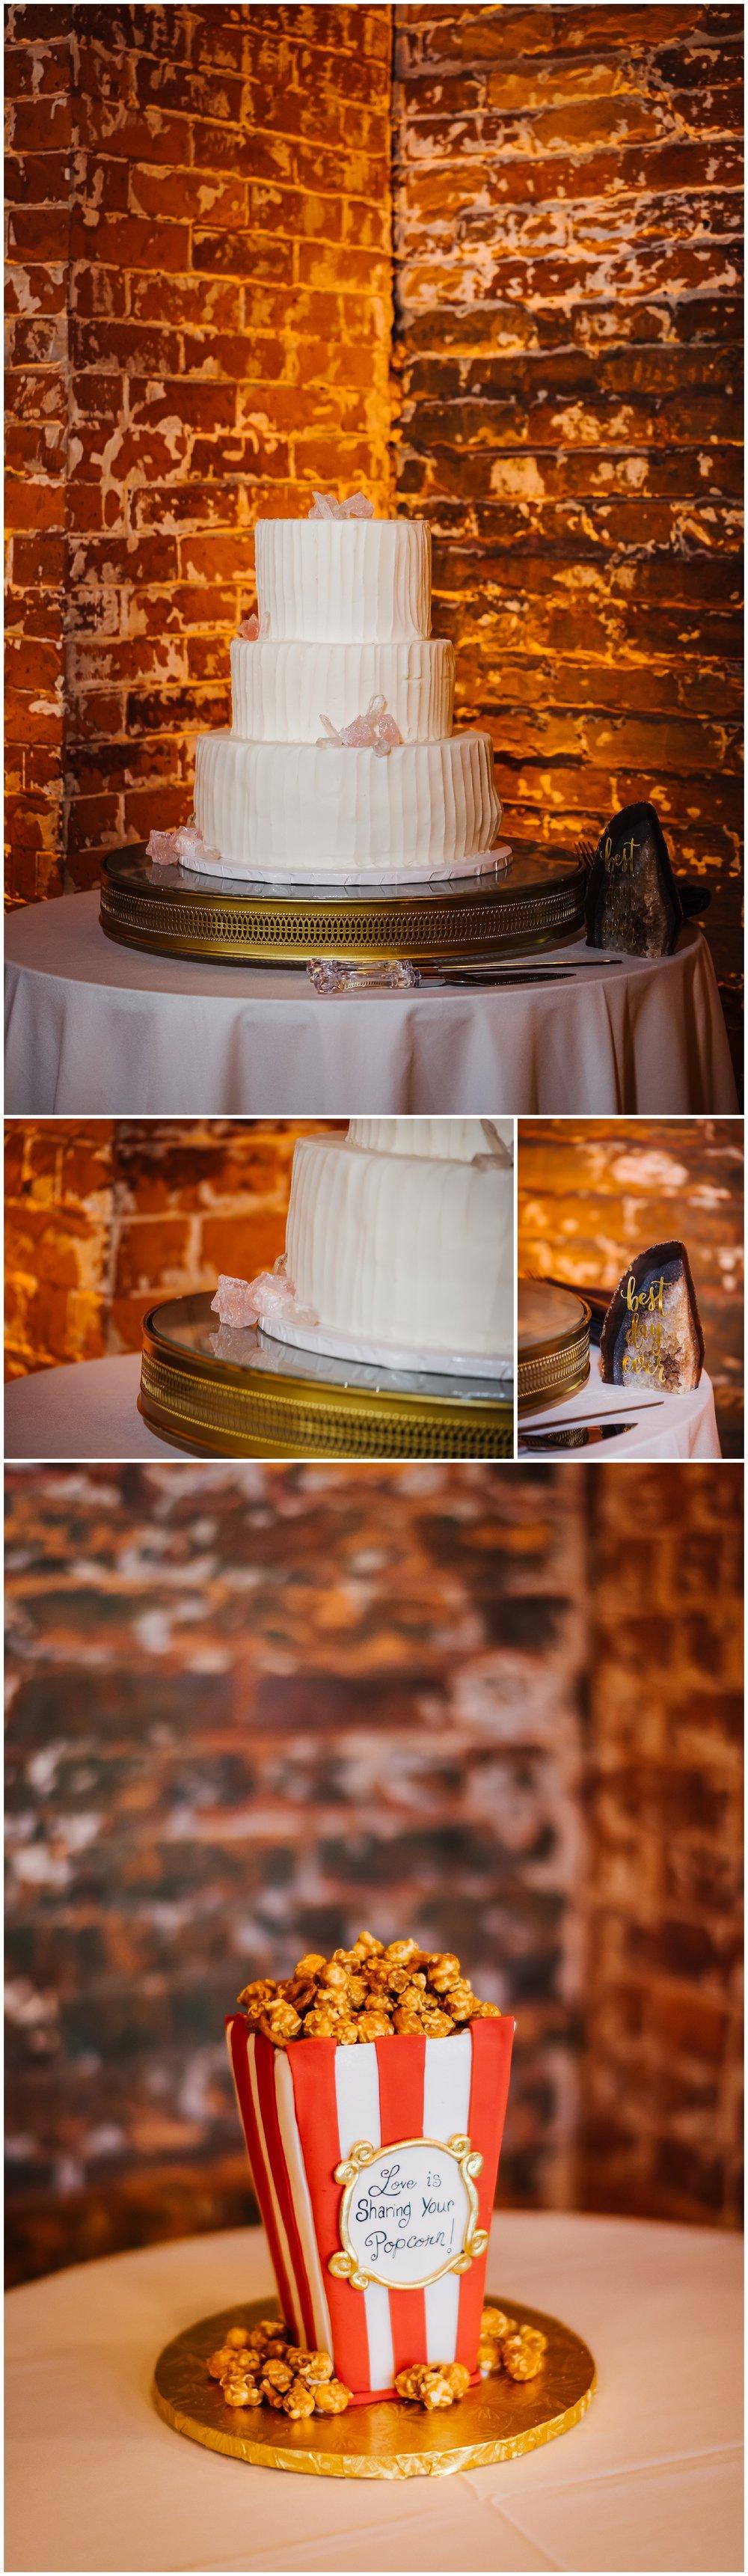 tampa-armeture-wedding-photographer-edgy-industrial-downtown-fancy-free-nursery-tattoo-burgandy-velvet_0064.jpg